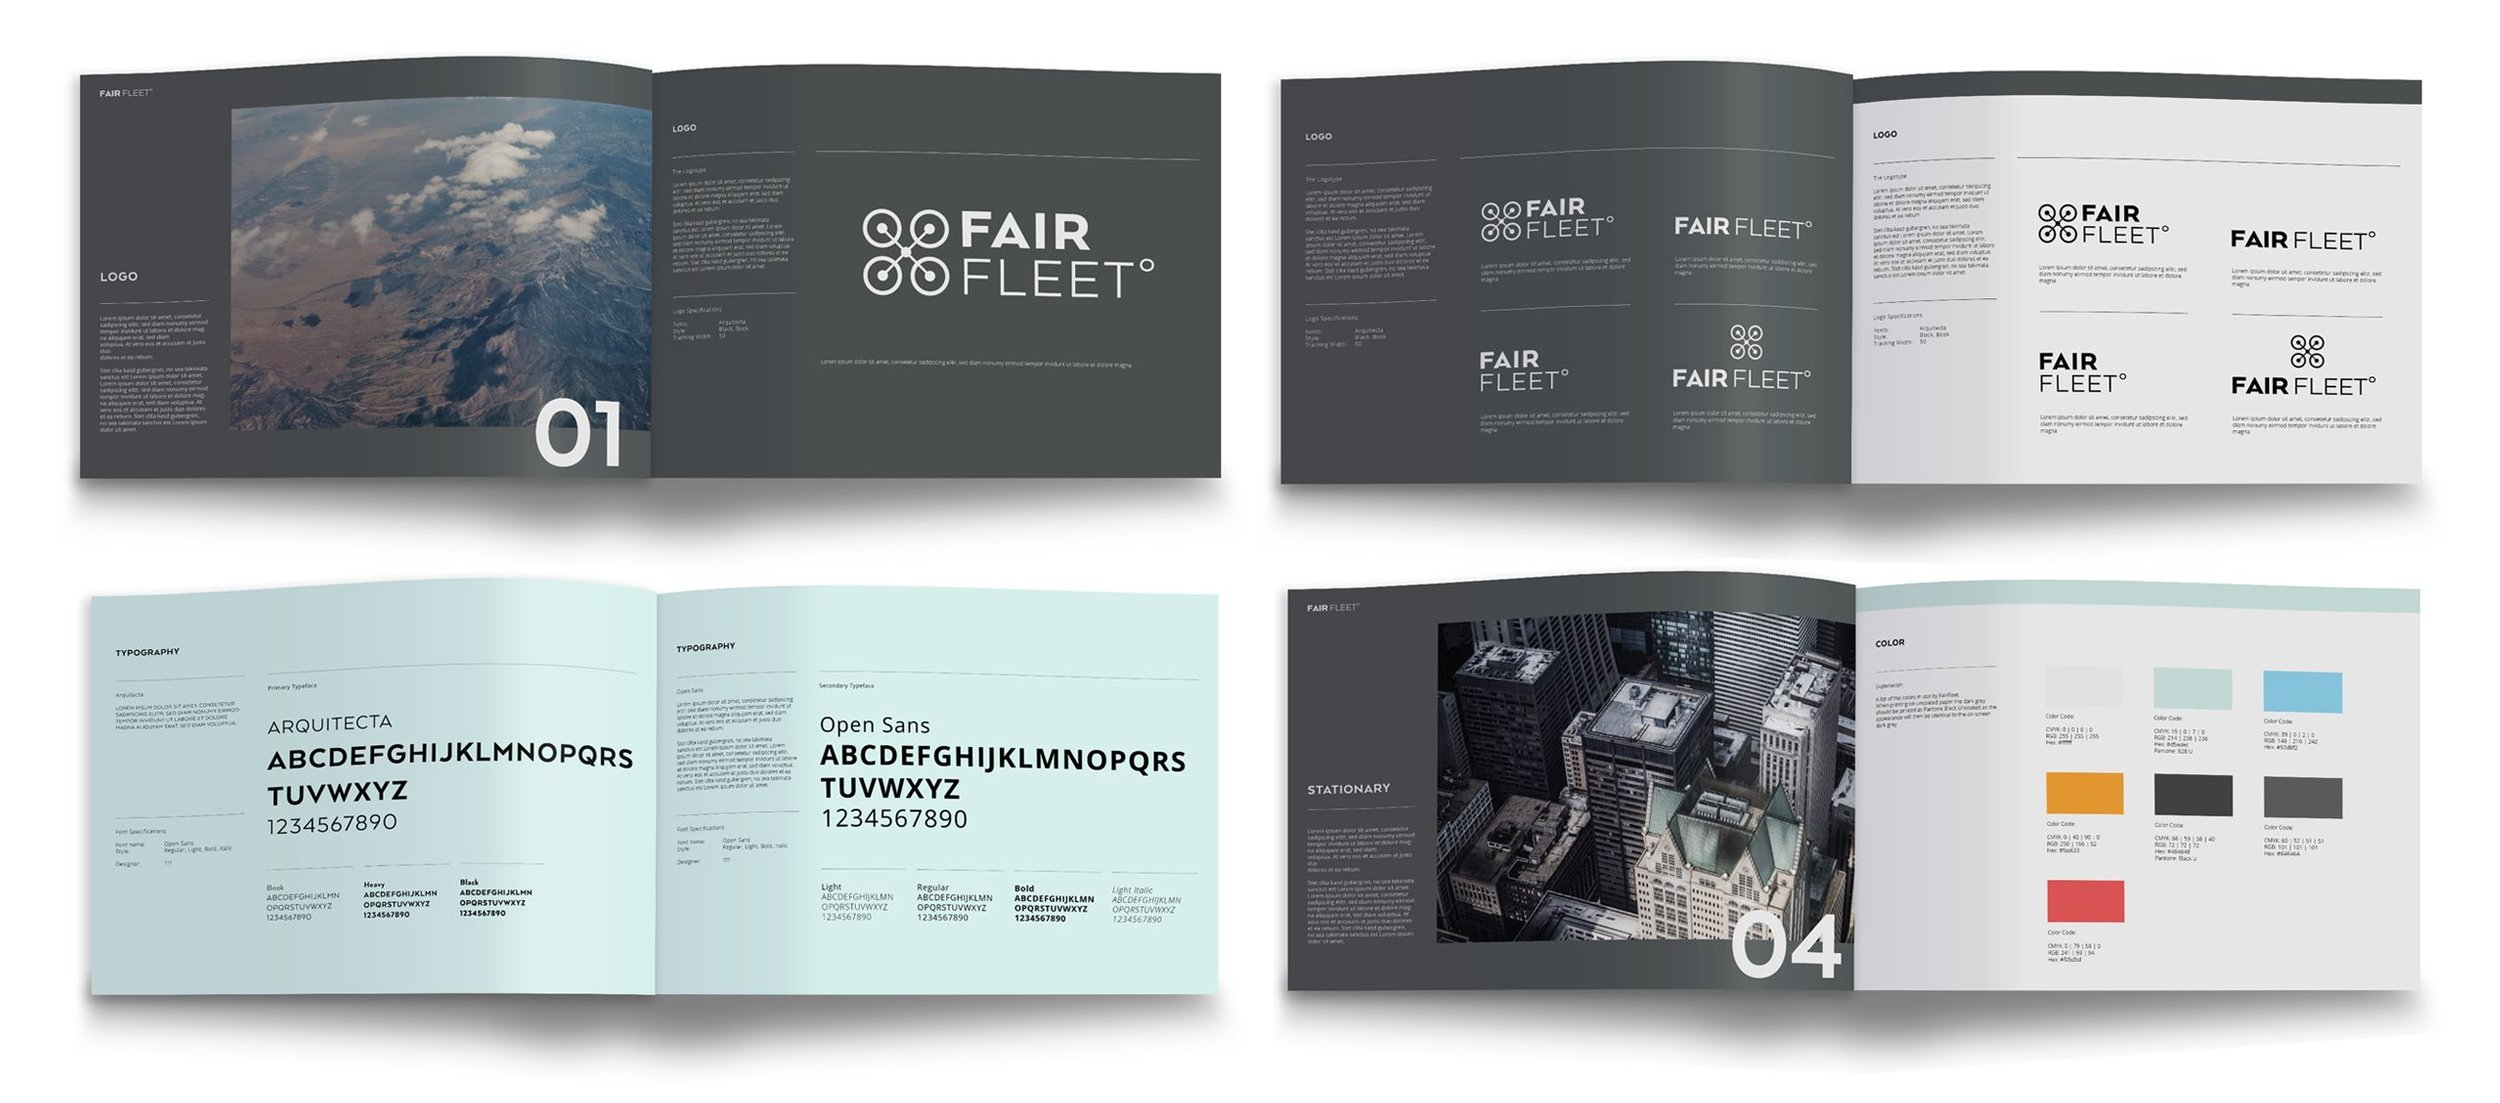 Fairfleet-Brandbook-compressor.jpg